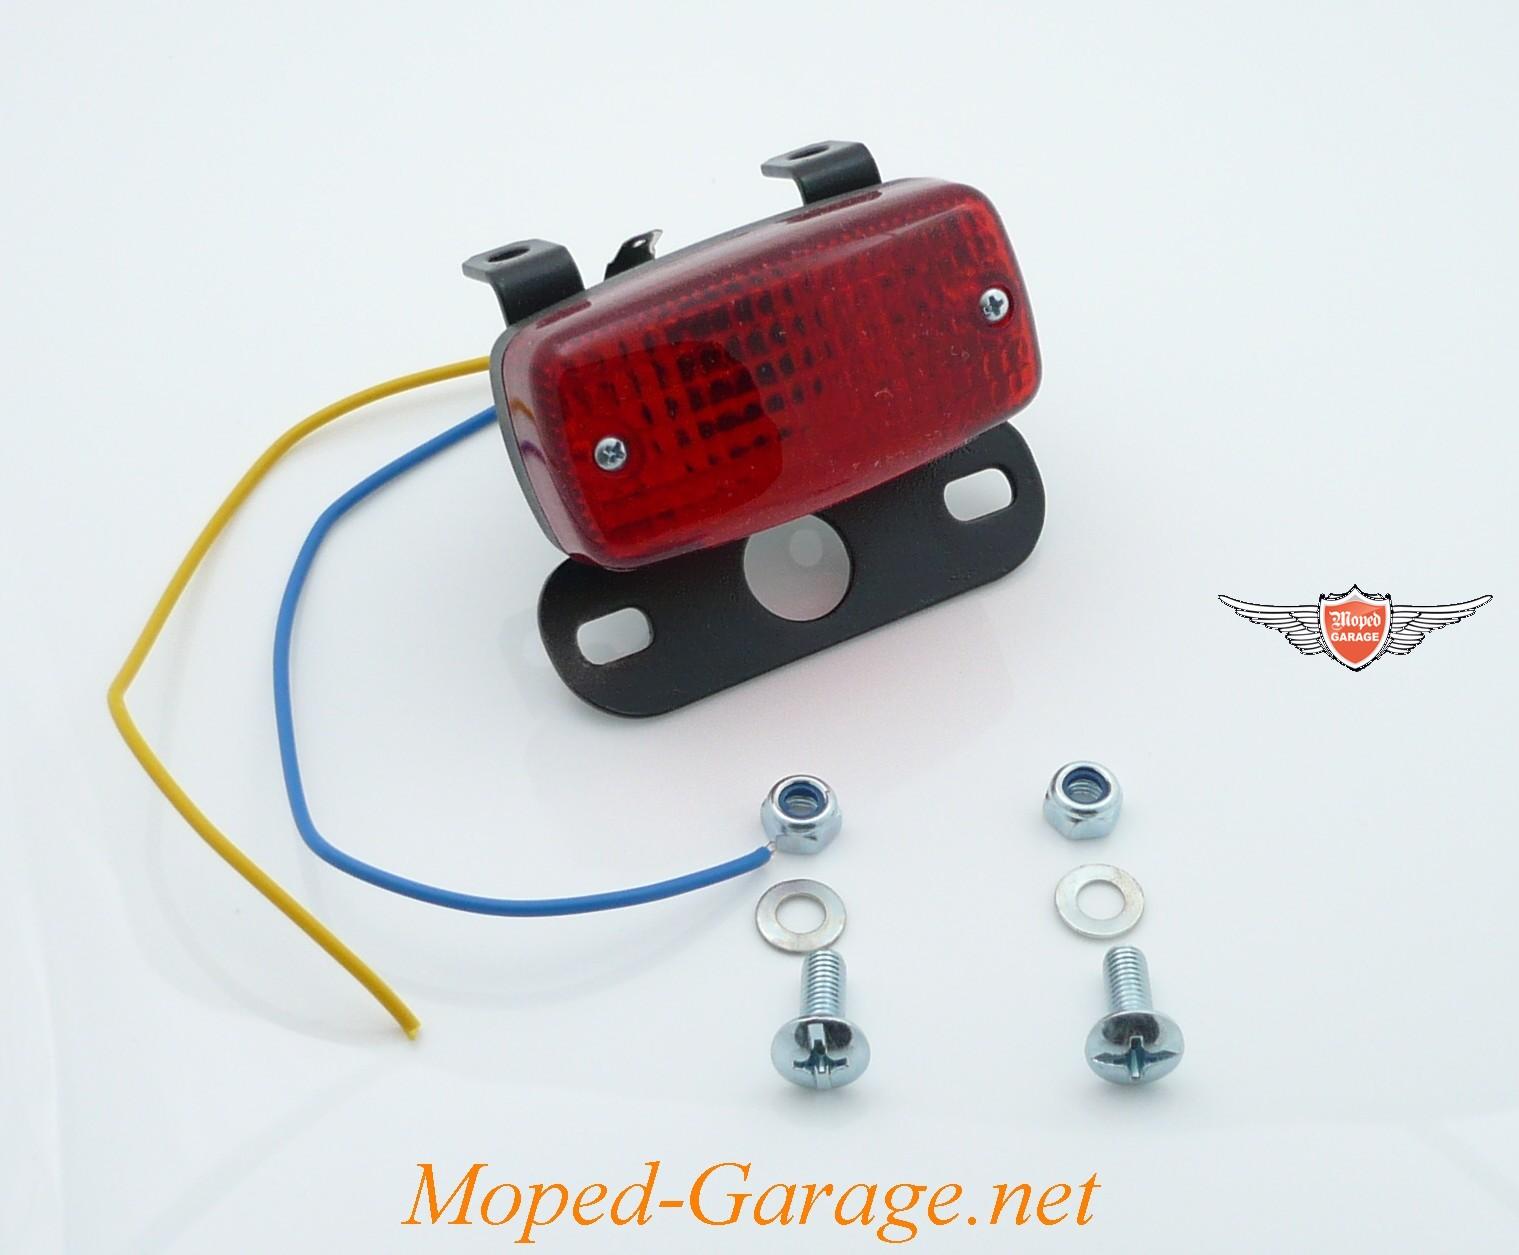 moped mofa moped mokick universal mini. Black Bedroom Furniture Sets. Home Design Ideas